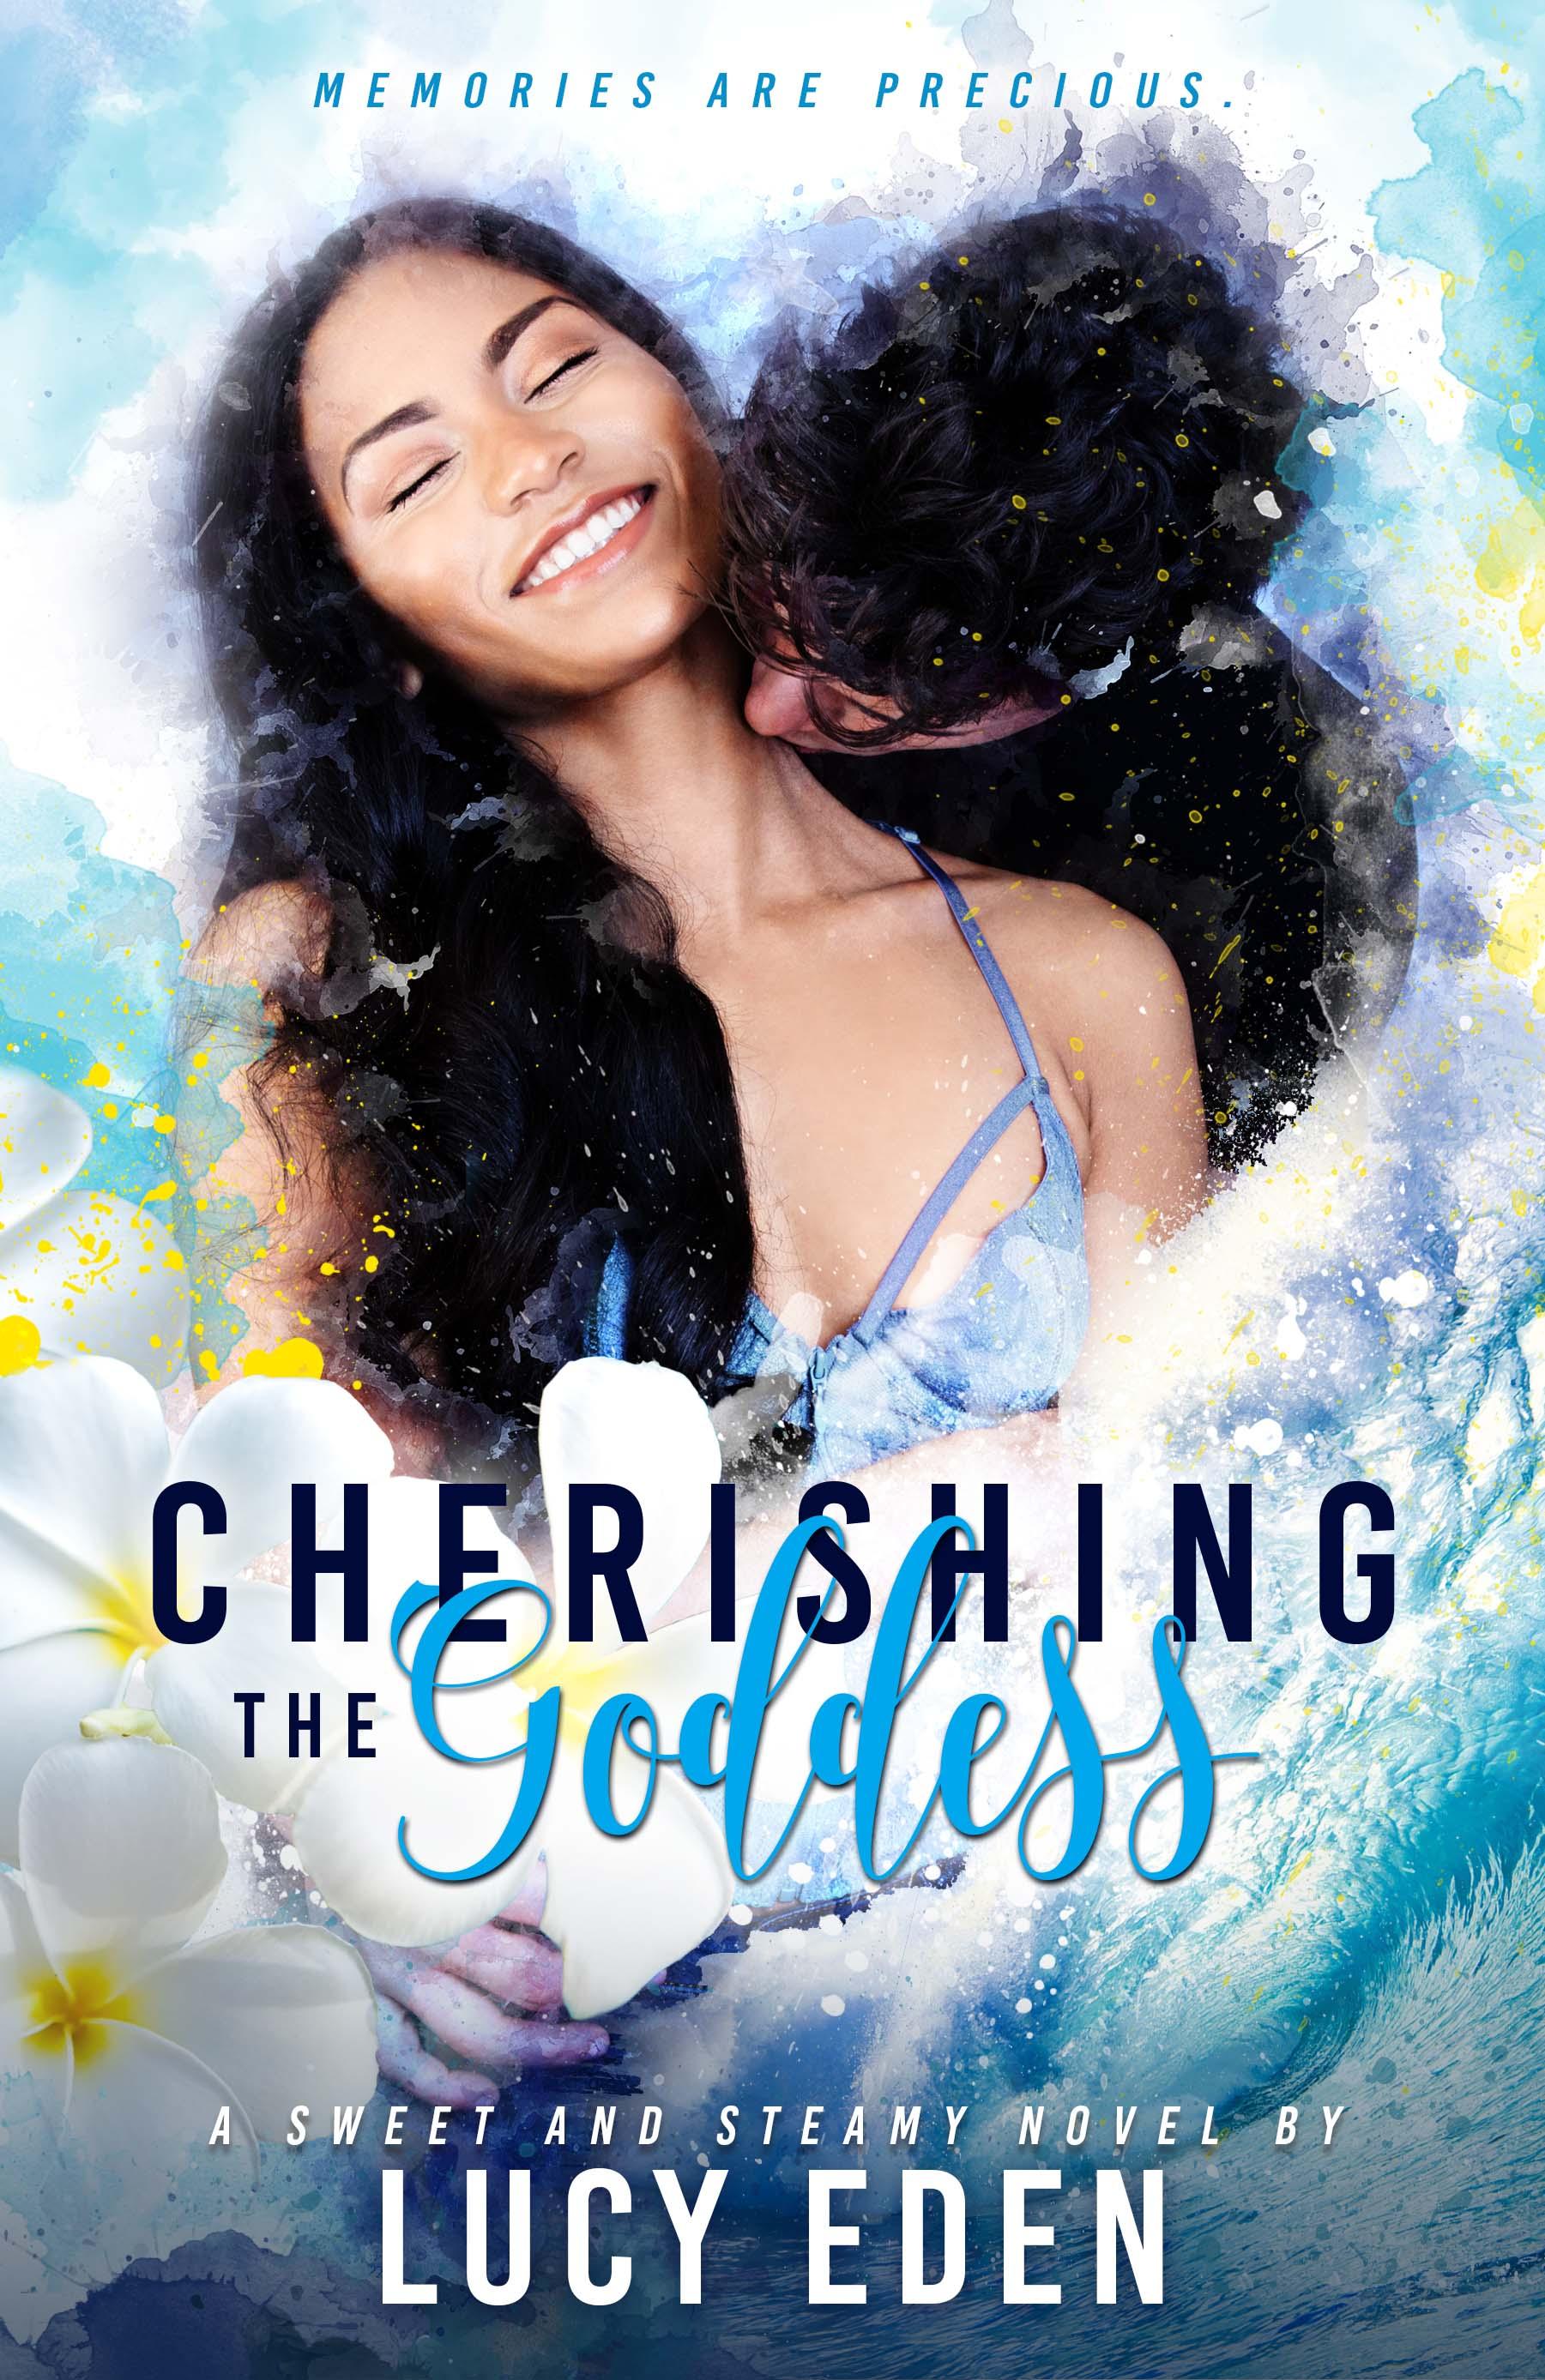 Lucy Eden Cherishing the Goddess